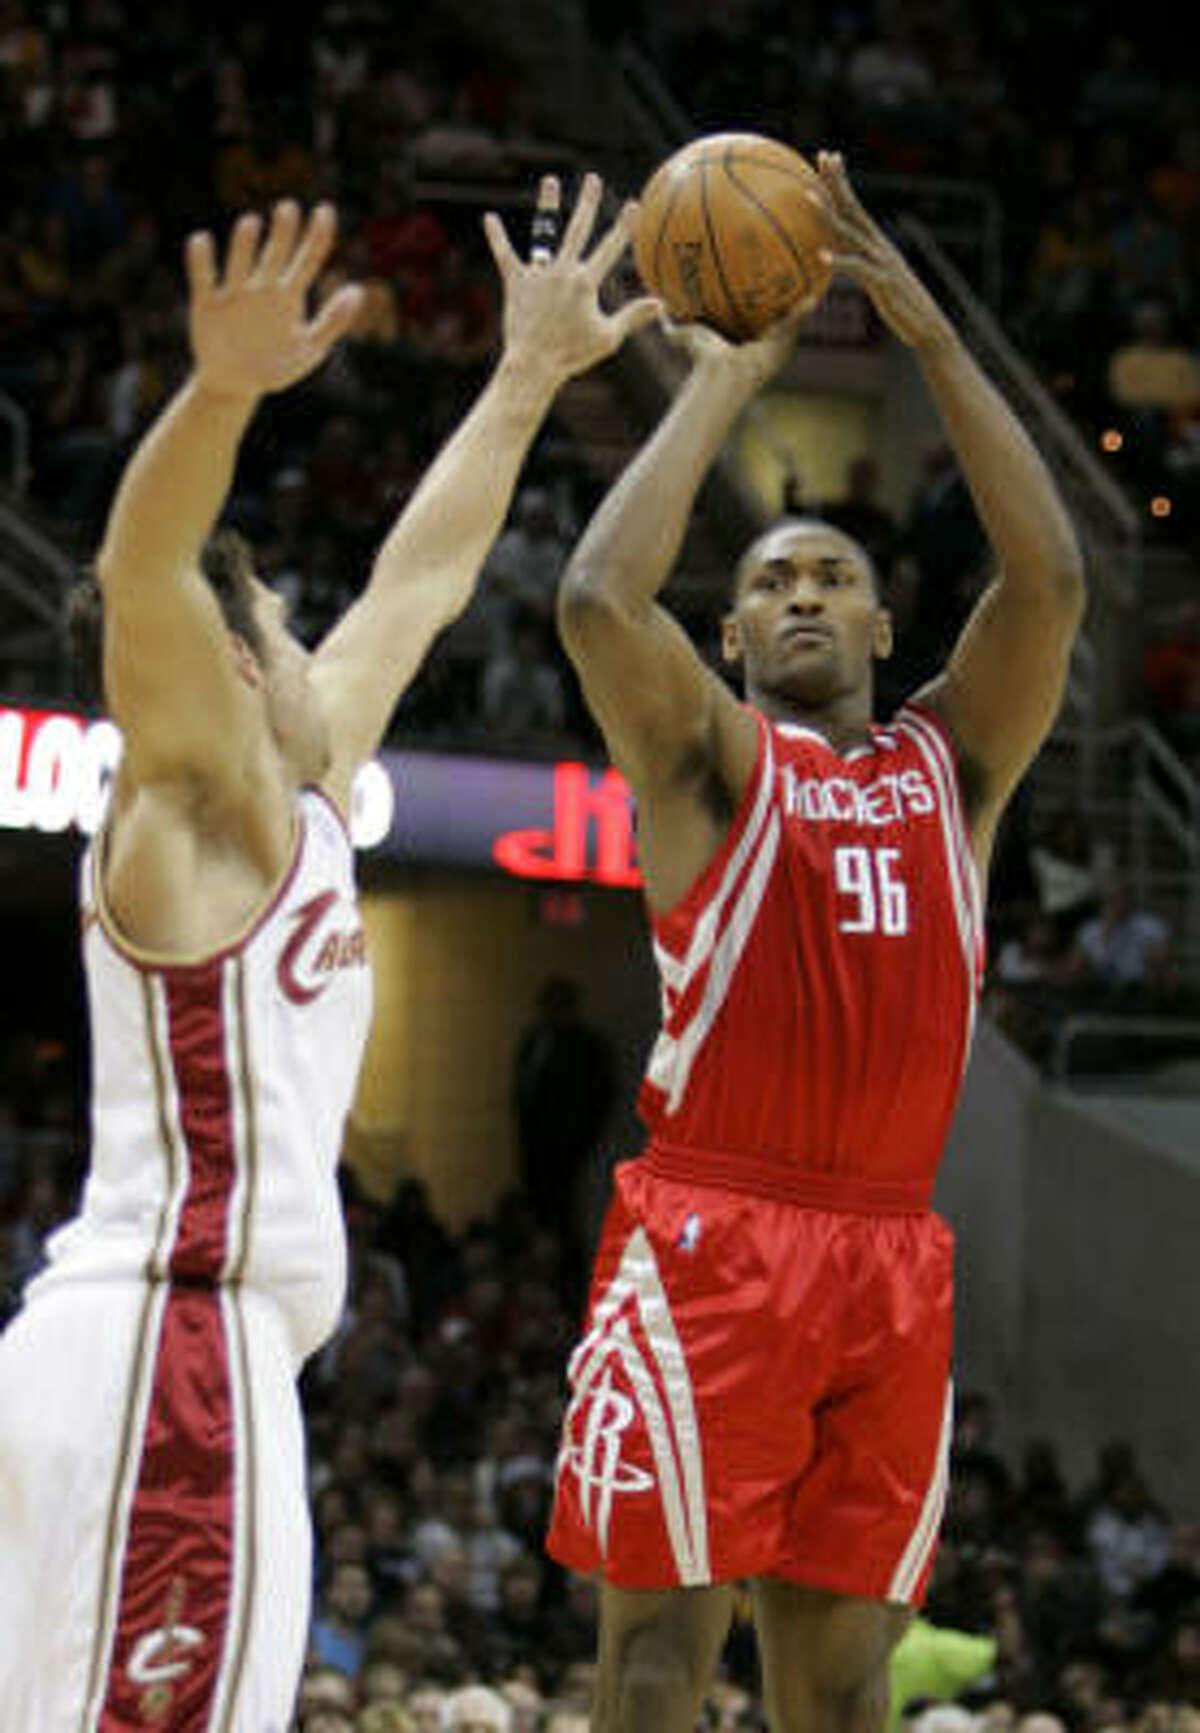 Houston Rockets' Ron Artest shoots a three-point shot over Cleveland Cavaliers' Wally Szczerbiak.